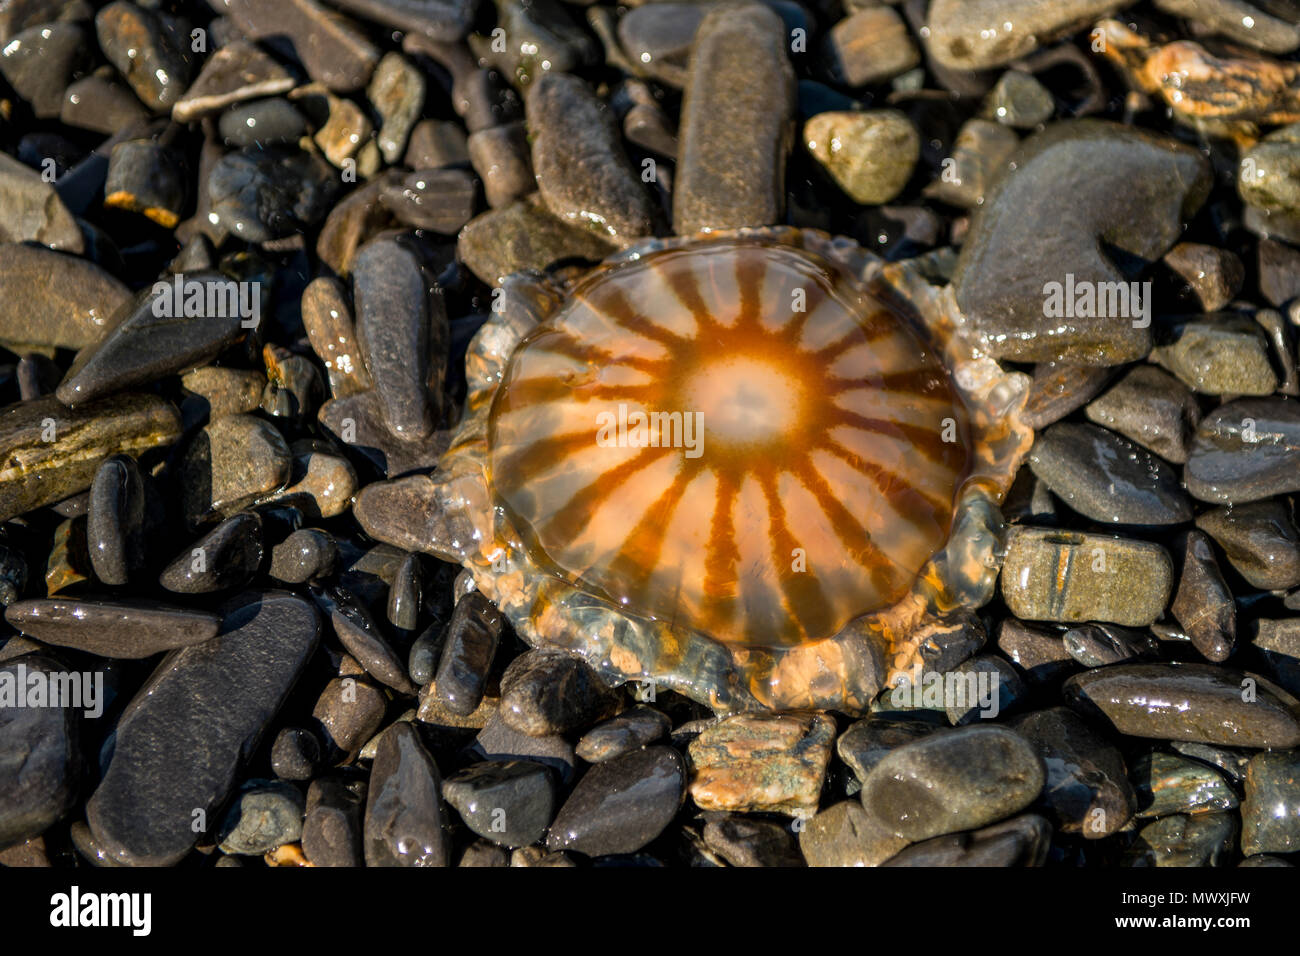 Moon Jellyfish (Aurelia aurita), Resurrection Bay, Kenai Fjords National Park, Alaska, United States of America, North America - Stock Image